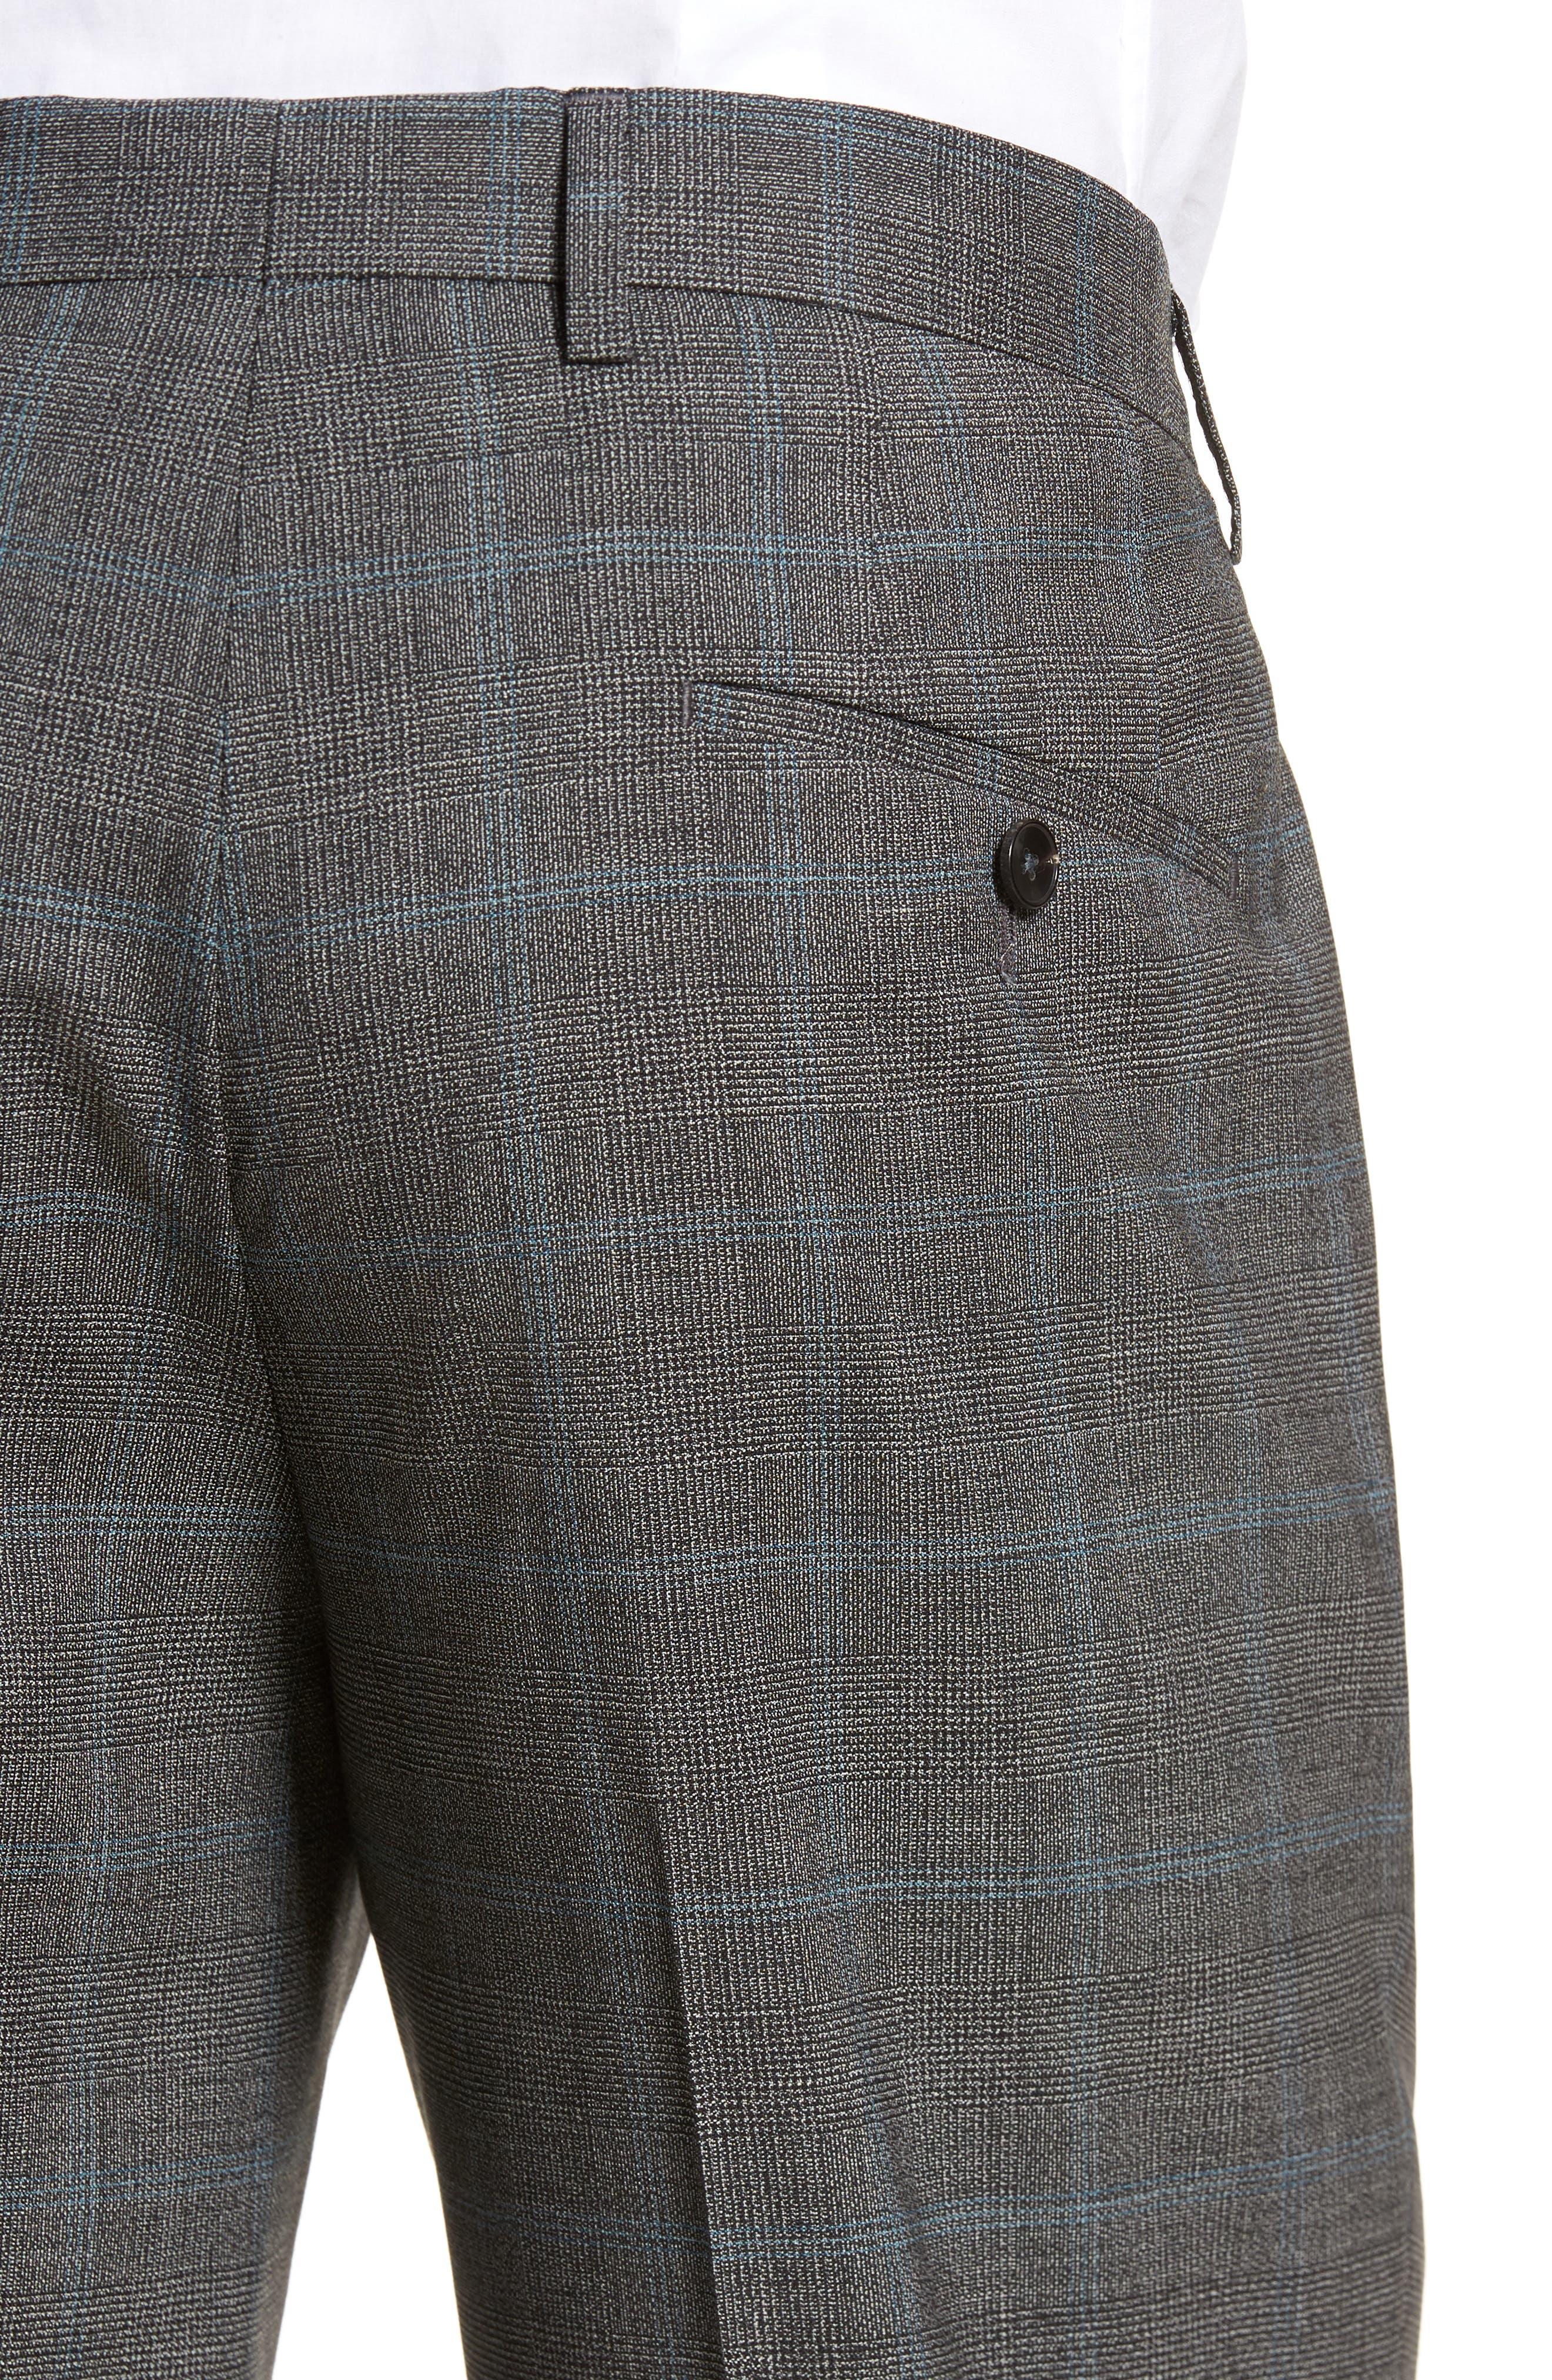 Genesis Flat Front Plaid Wool Trousers,                             Alternate thumbnail 4, color,                             061